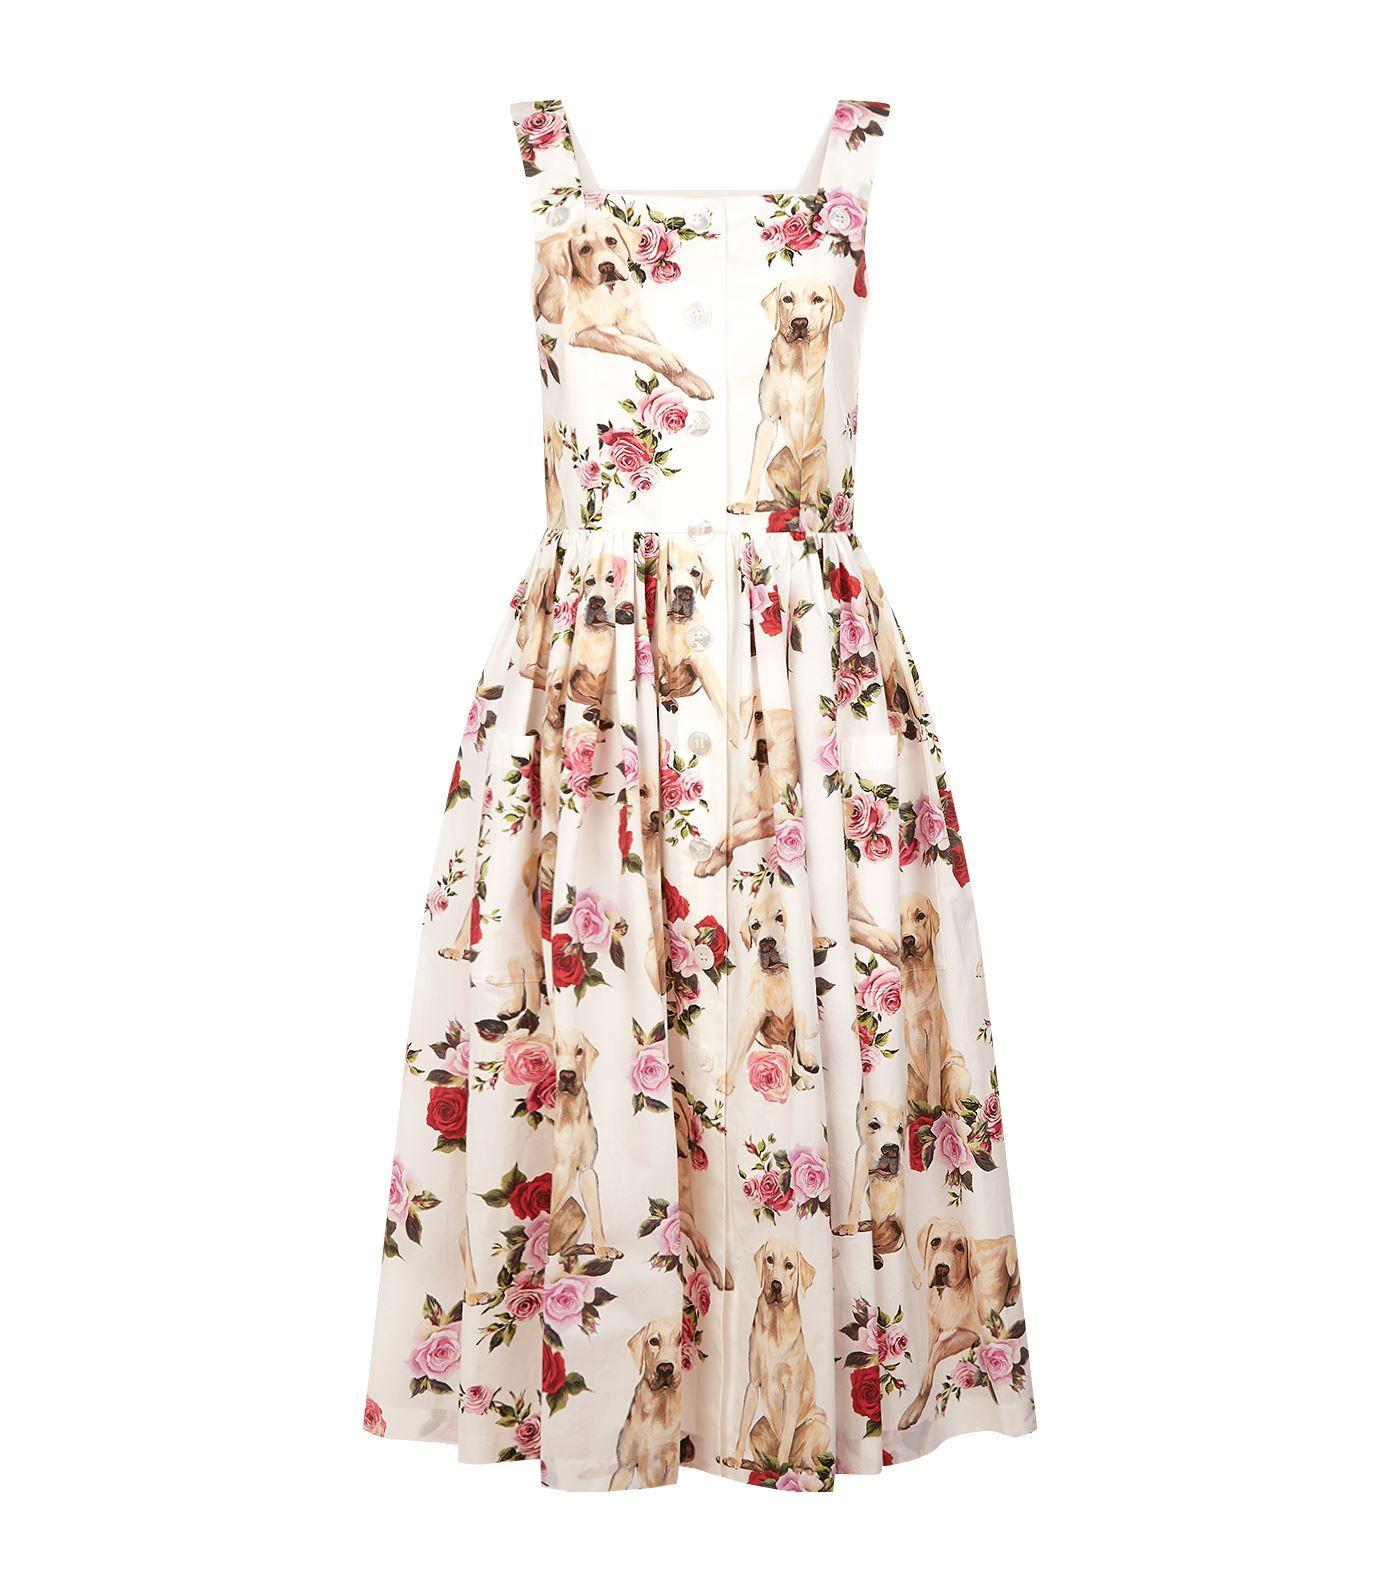 b3071684 Dolce & Gabbana Labrador Print Cotton Dress | Harrods.com | Dress ...